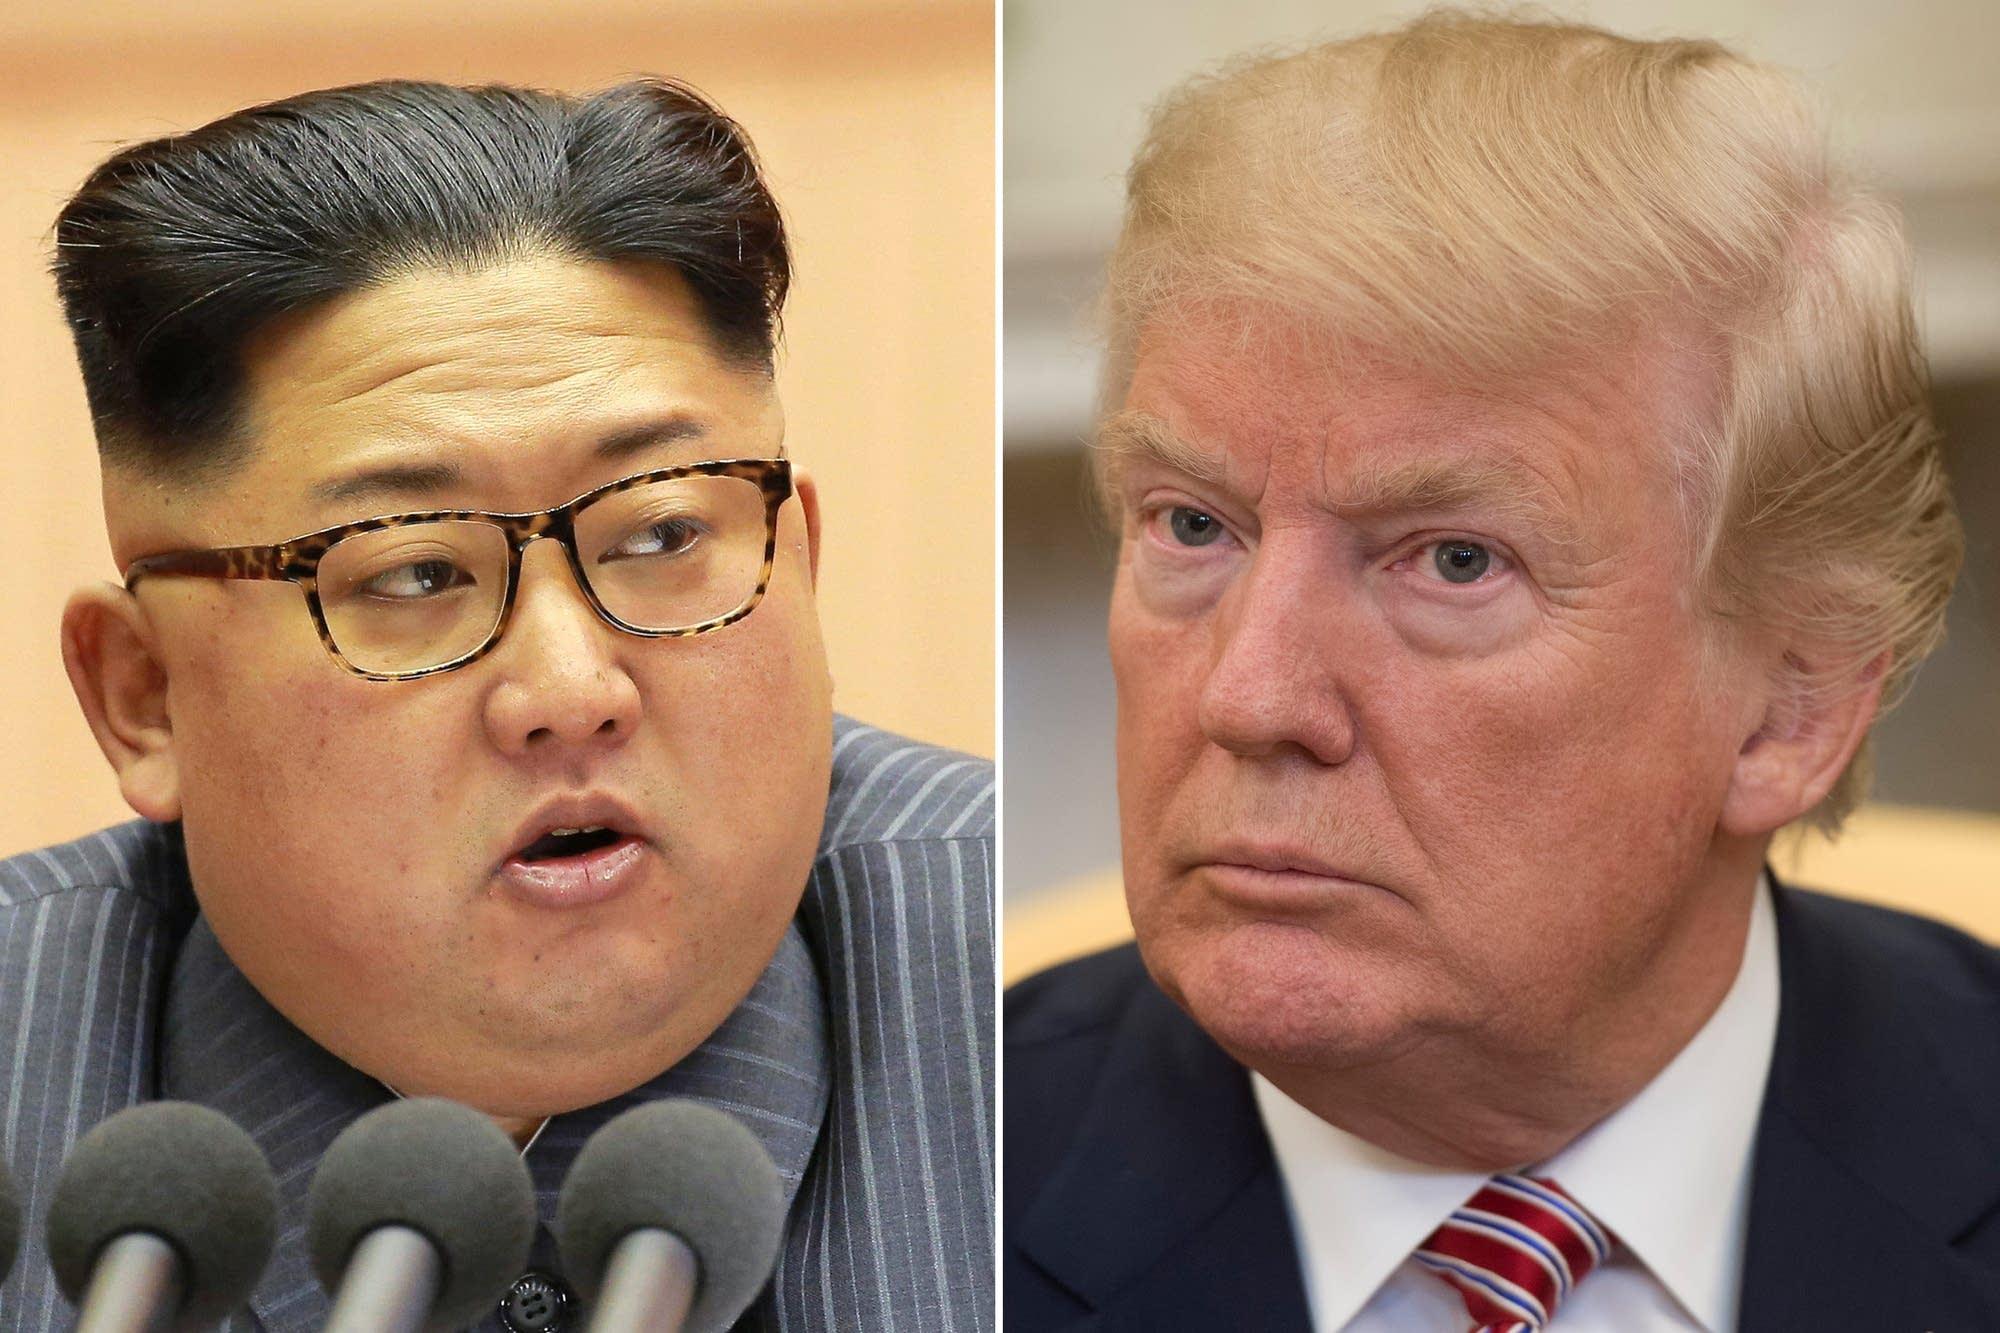 Kim Jong Un and President Trump